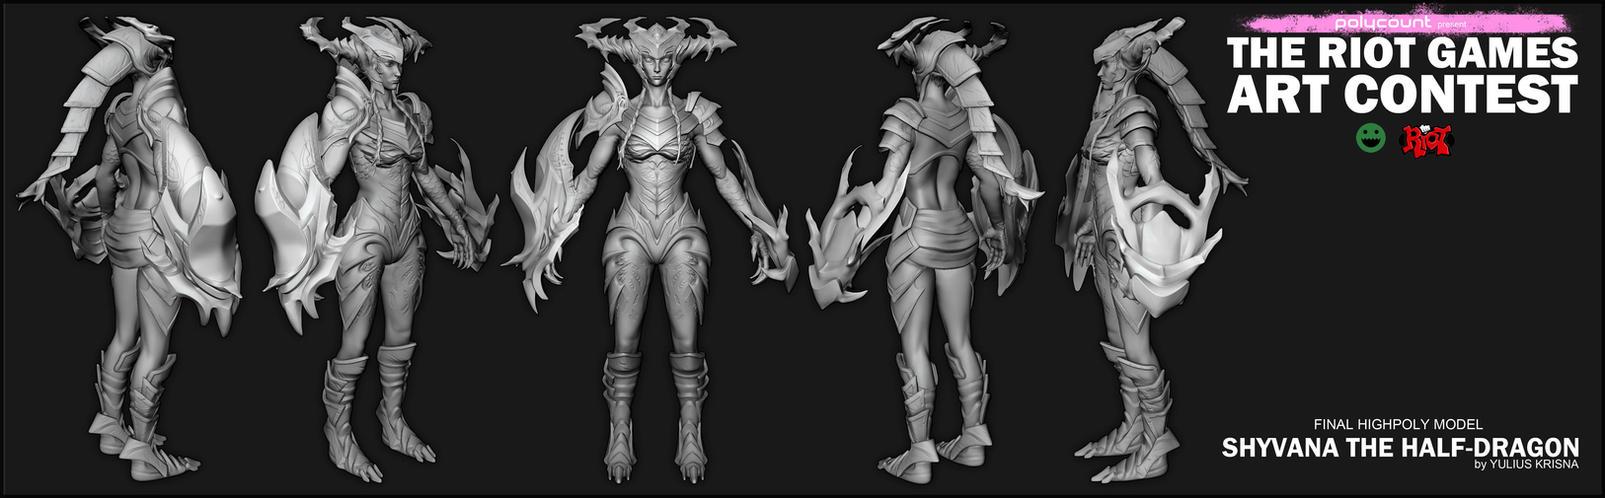 [Final/HP]Shyvana The Half-Dragon by YuliusKrisna